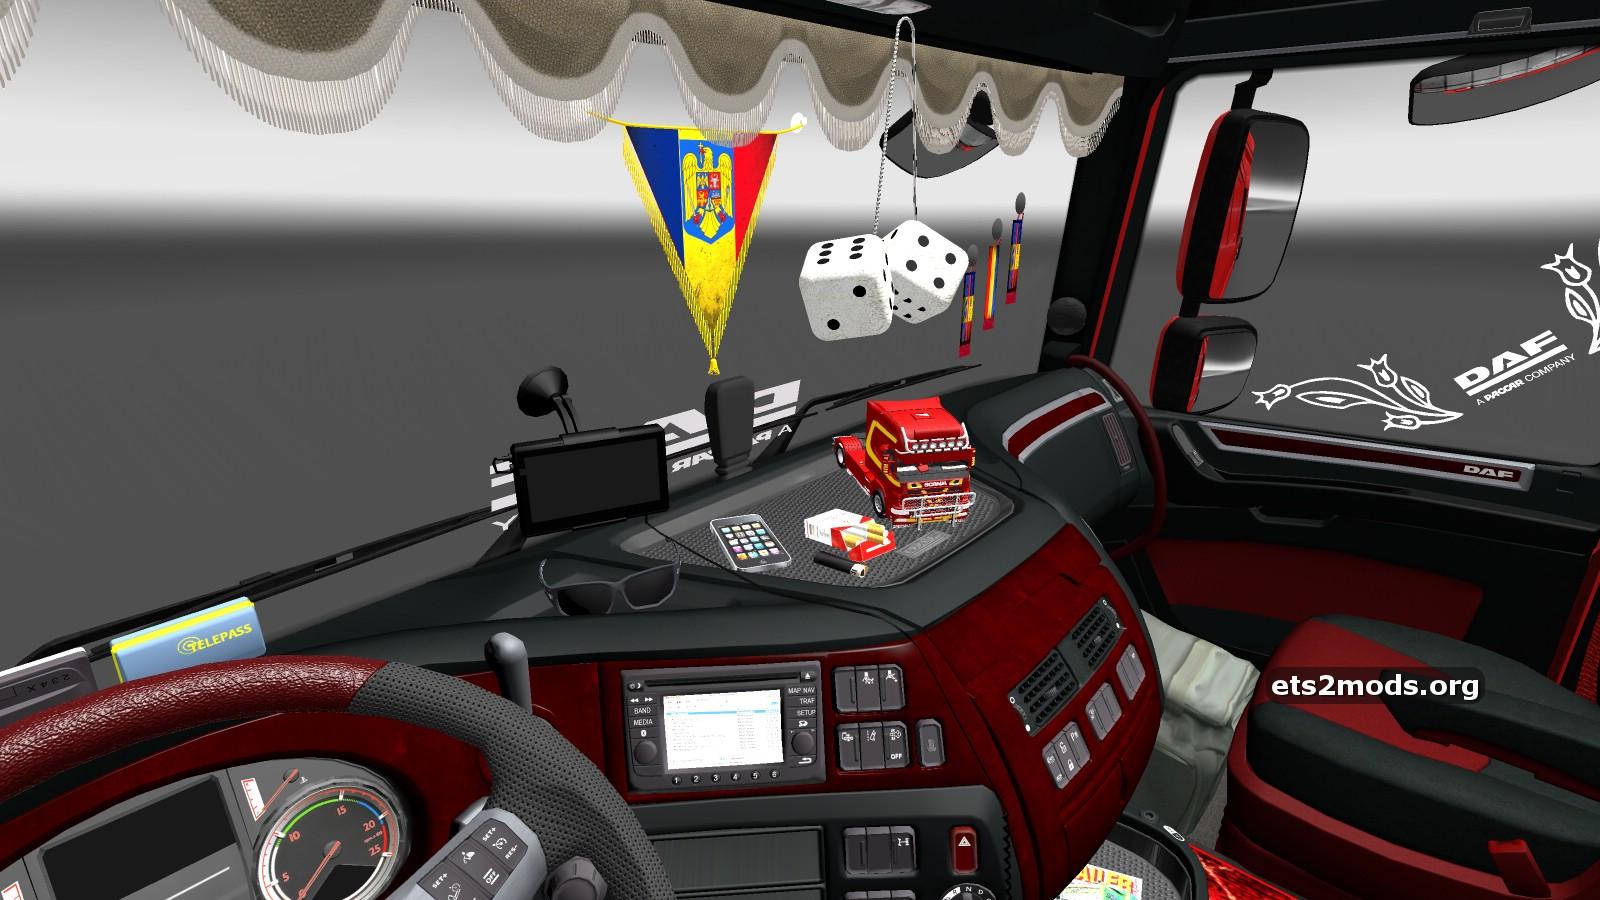 Daf euro 6 romanian interior mod ets2 mods for Daf euro 6 interieur